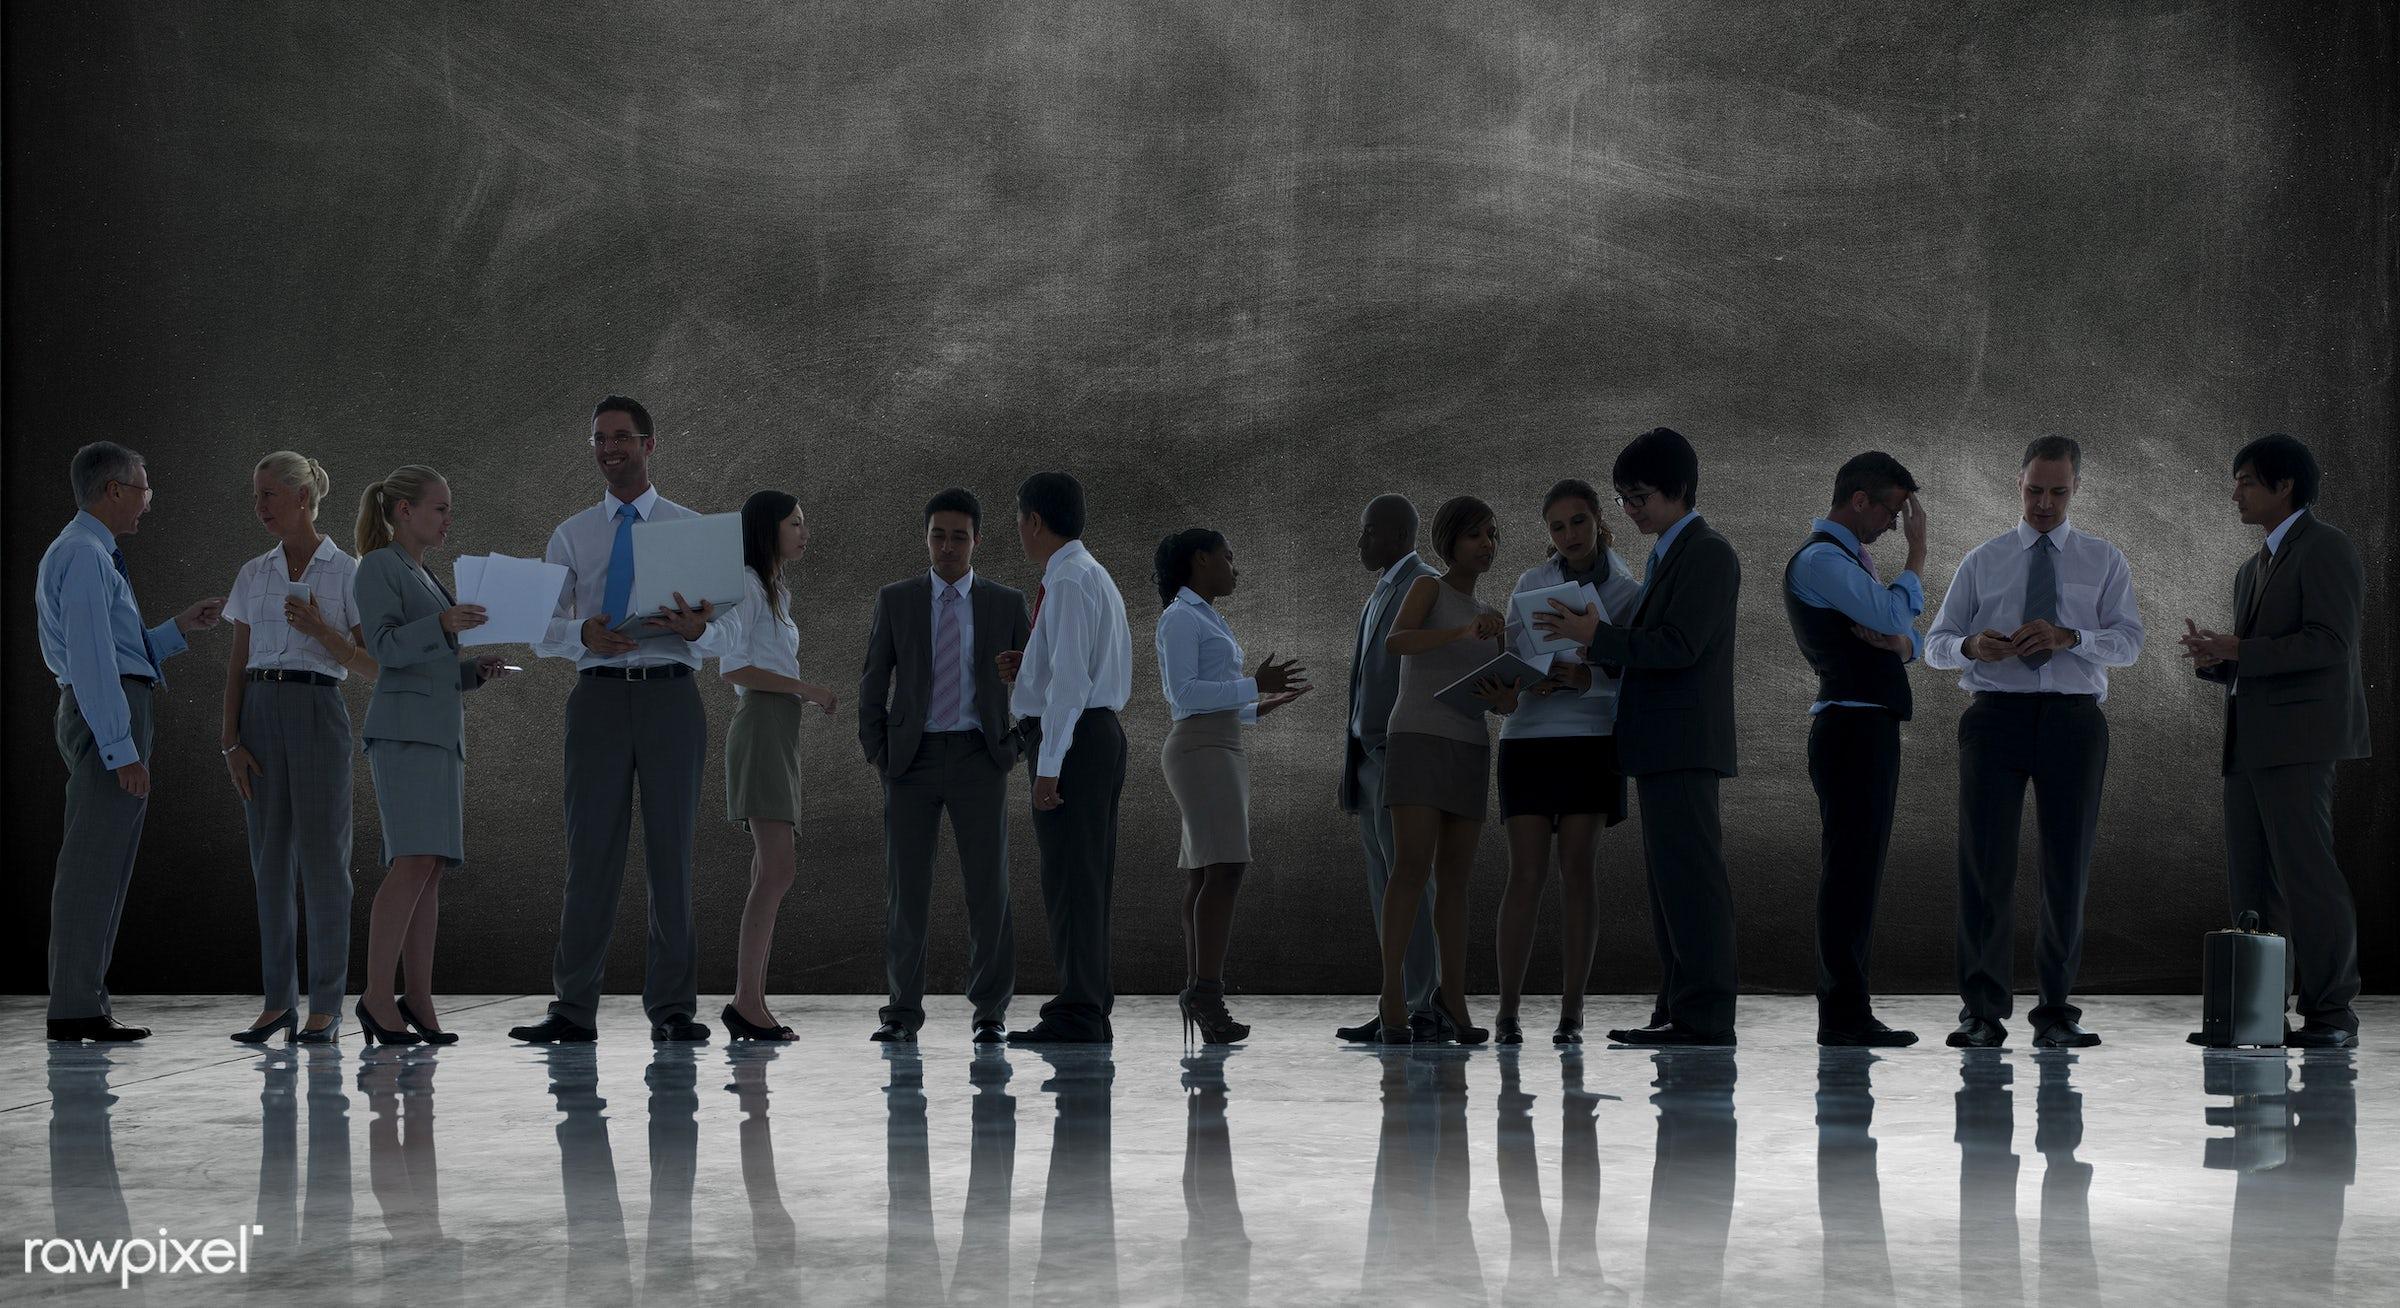 architecture, back lit, background, black, business, business people, businessmen, businesswomen, cement, communication,...